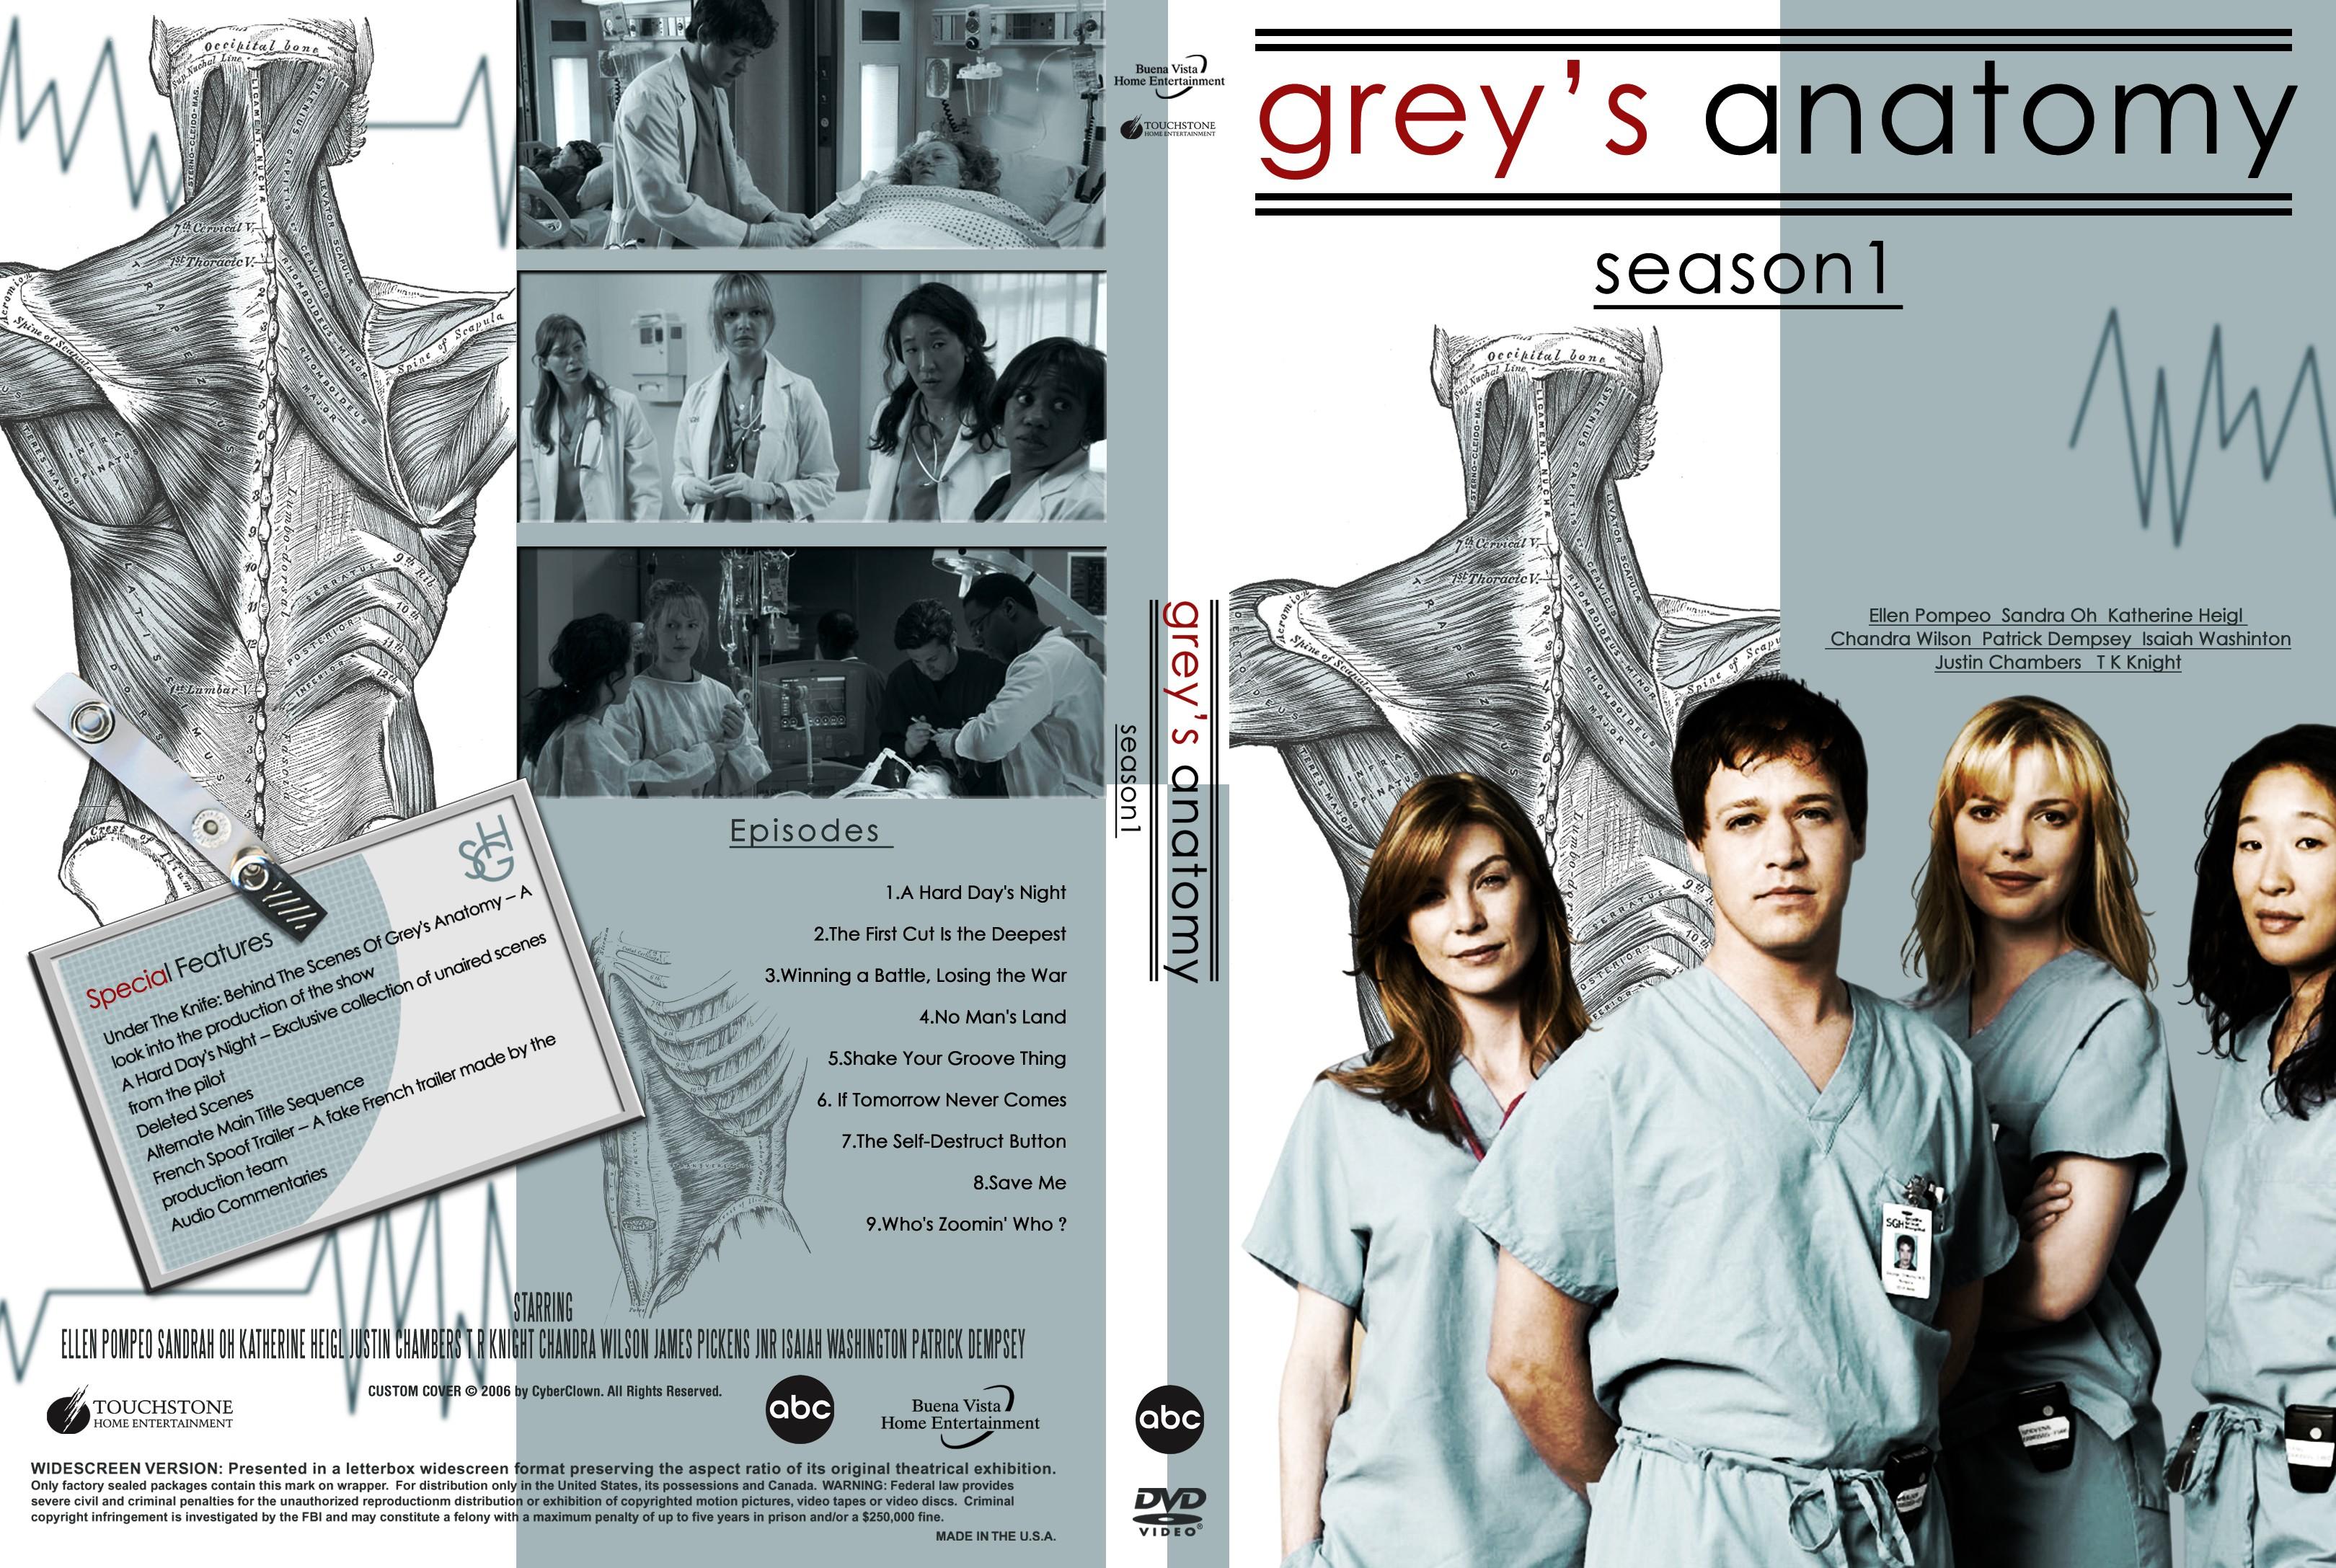 Greys Anatomy Season 9 Dvd Cover Image Information